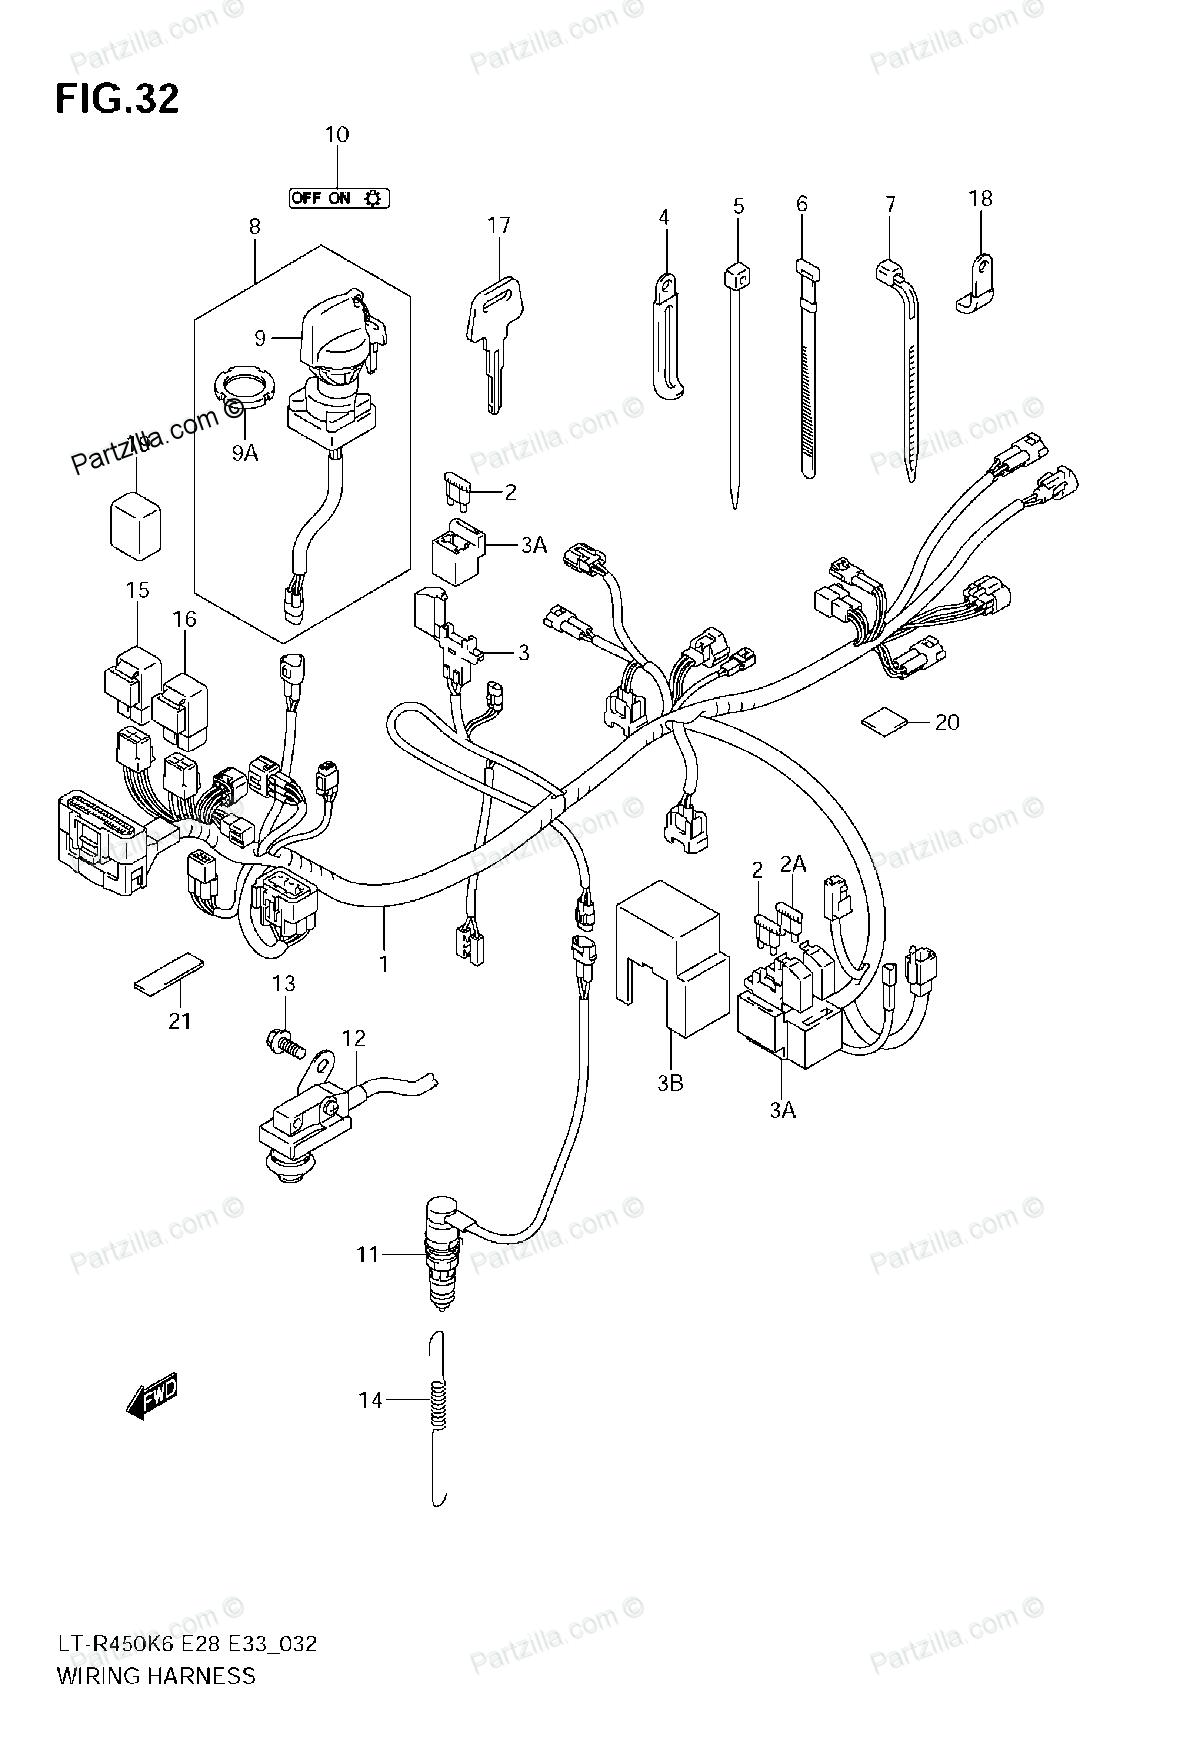 31813 Gsxr Timming as well P 0900c152800882fc in addition Suzuki Gsx R600 Srad Motorcycle 1998 additionally 50912 Zilla Oem Carburetor Cleaning Rebuild additionally 345905 400cc Jianshe No Spark Problem. on suzuki quadrunner 250 engine diagram